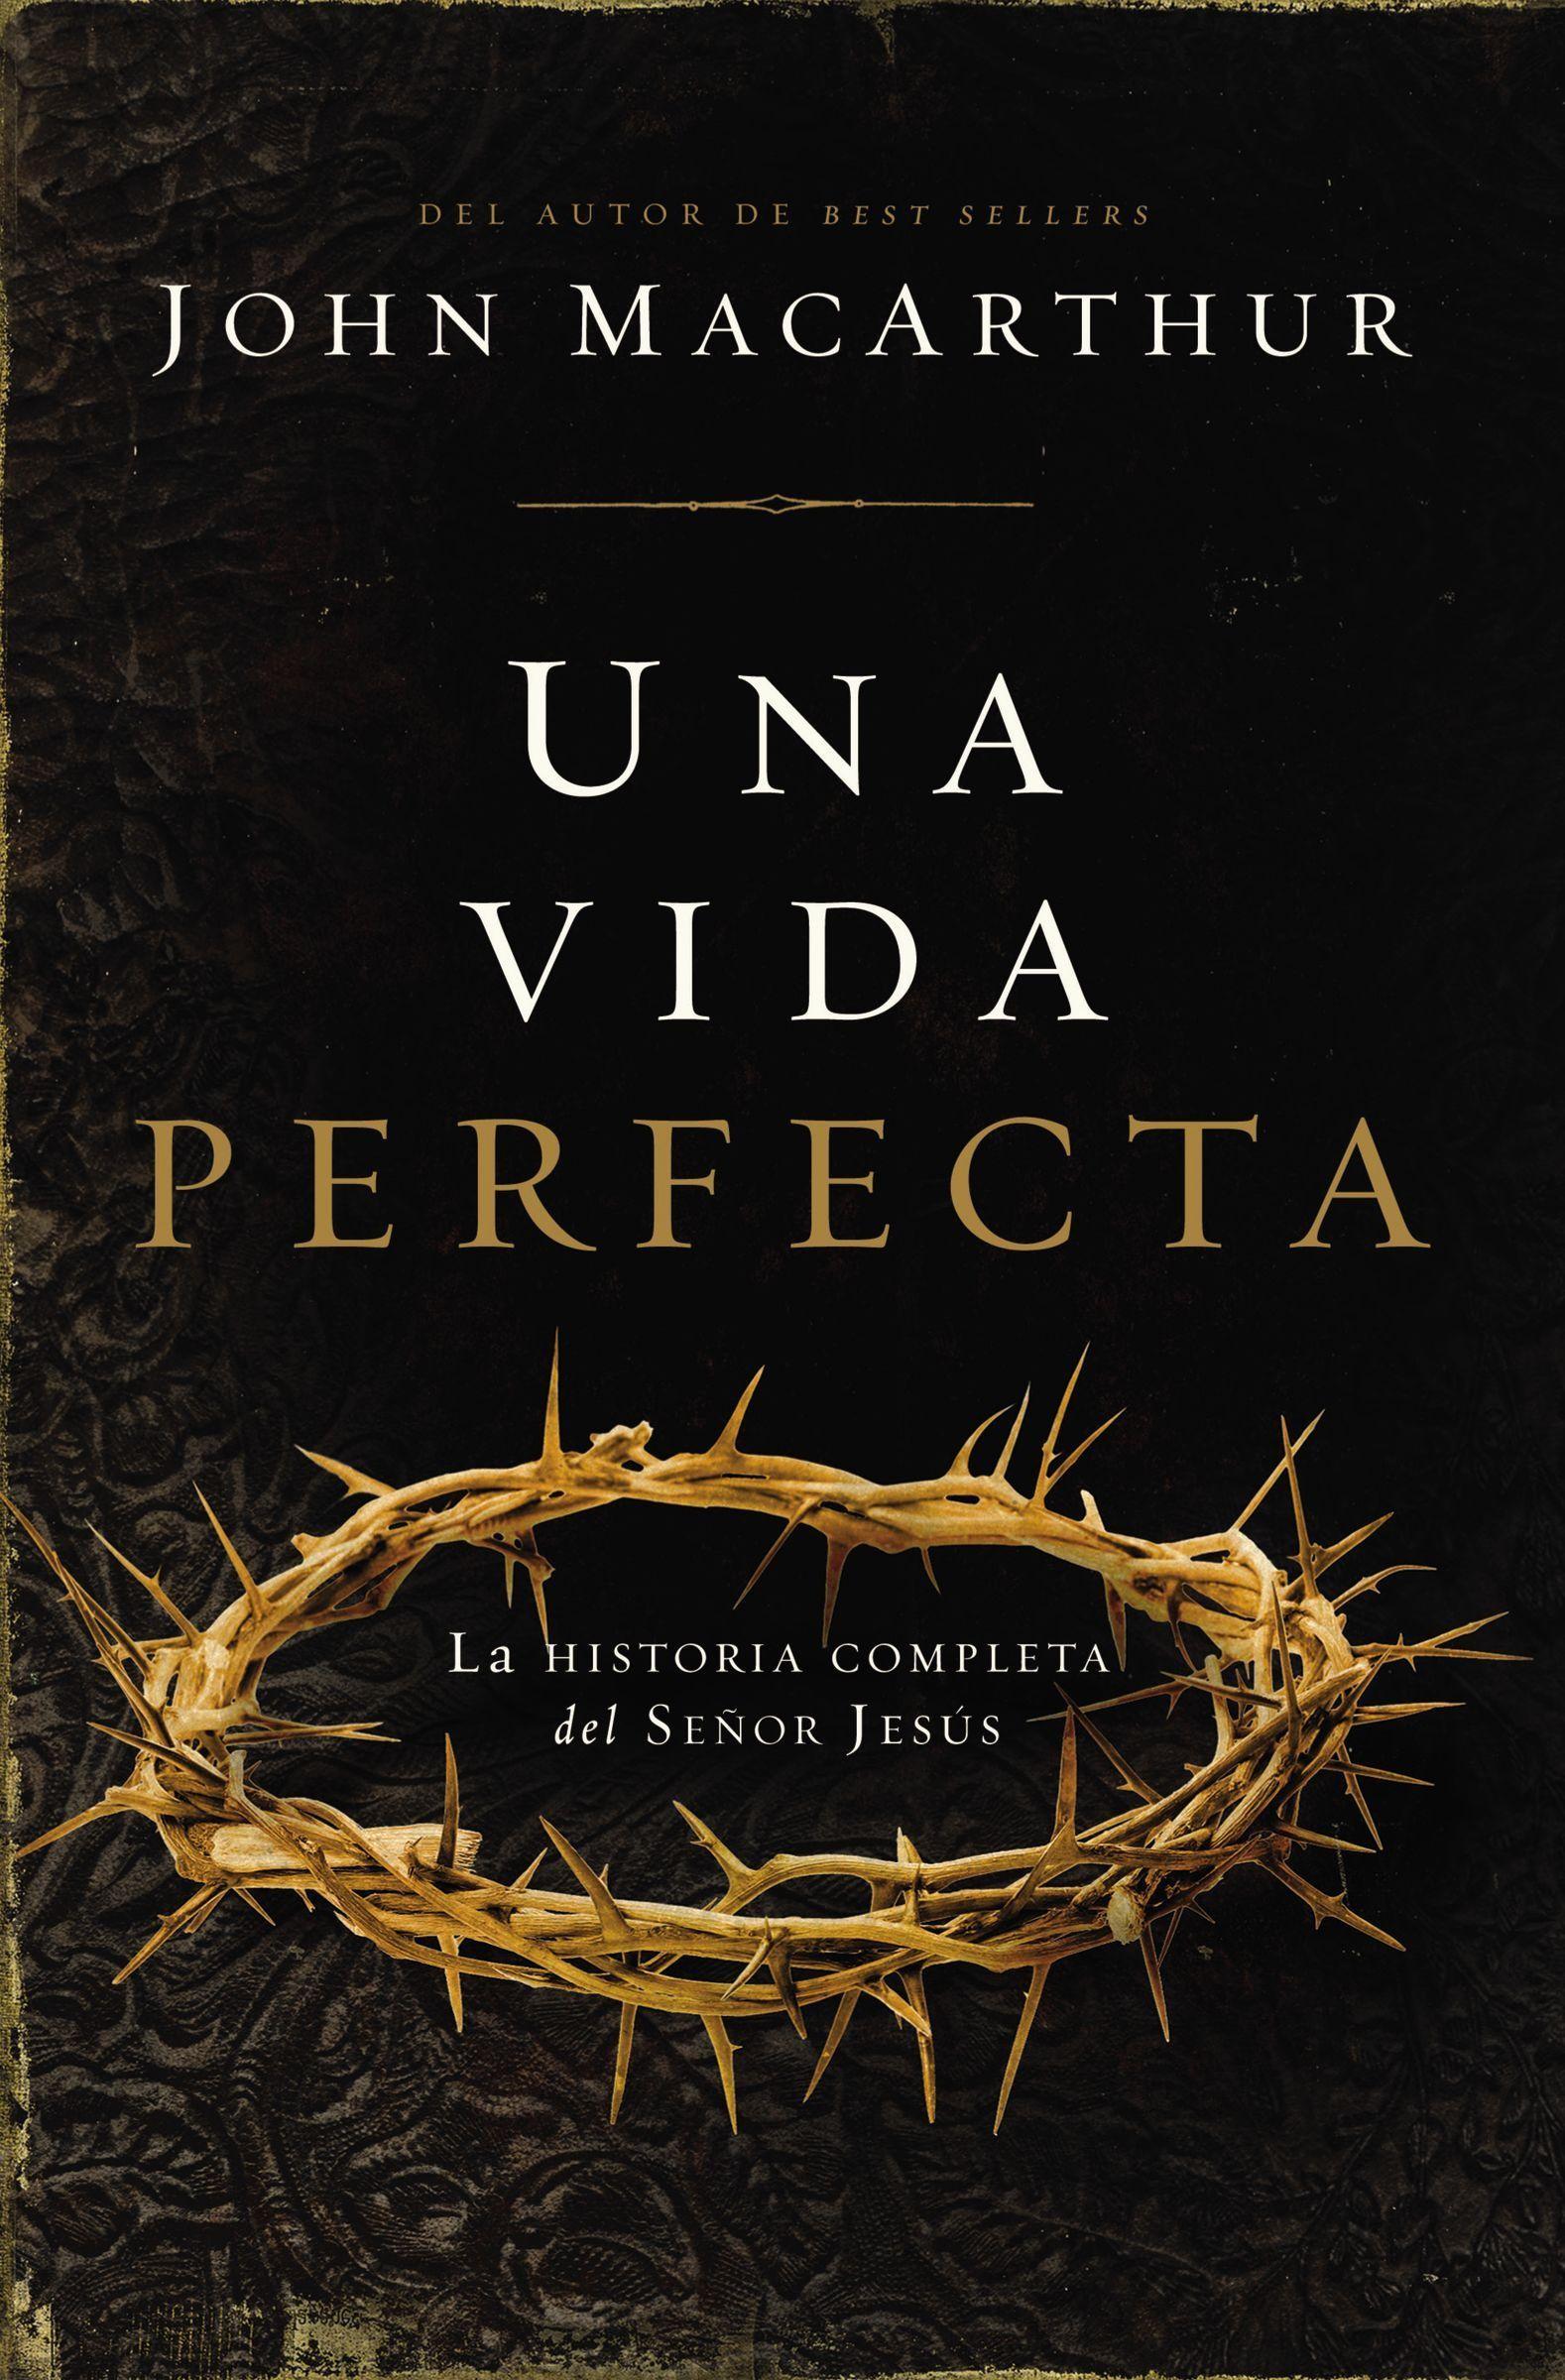 Una Vida Perfecta - 9781602550452 - MacArthur, John F.